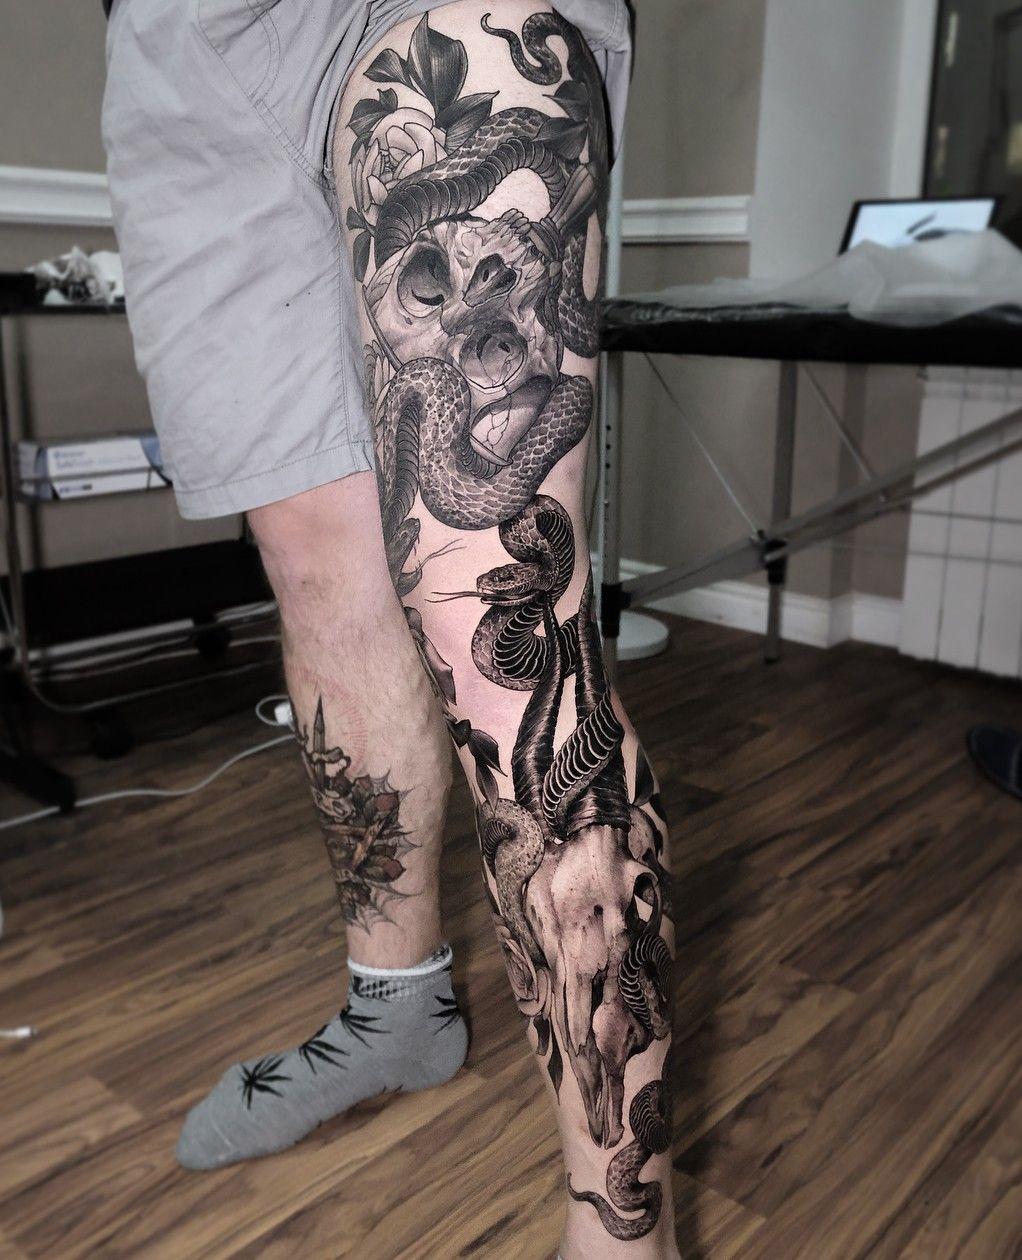 By Andrew Borisyuk Full Leg Tattoos Leg Sleeve Tattoo Leg Tattoo Men